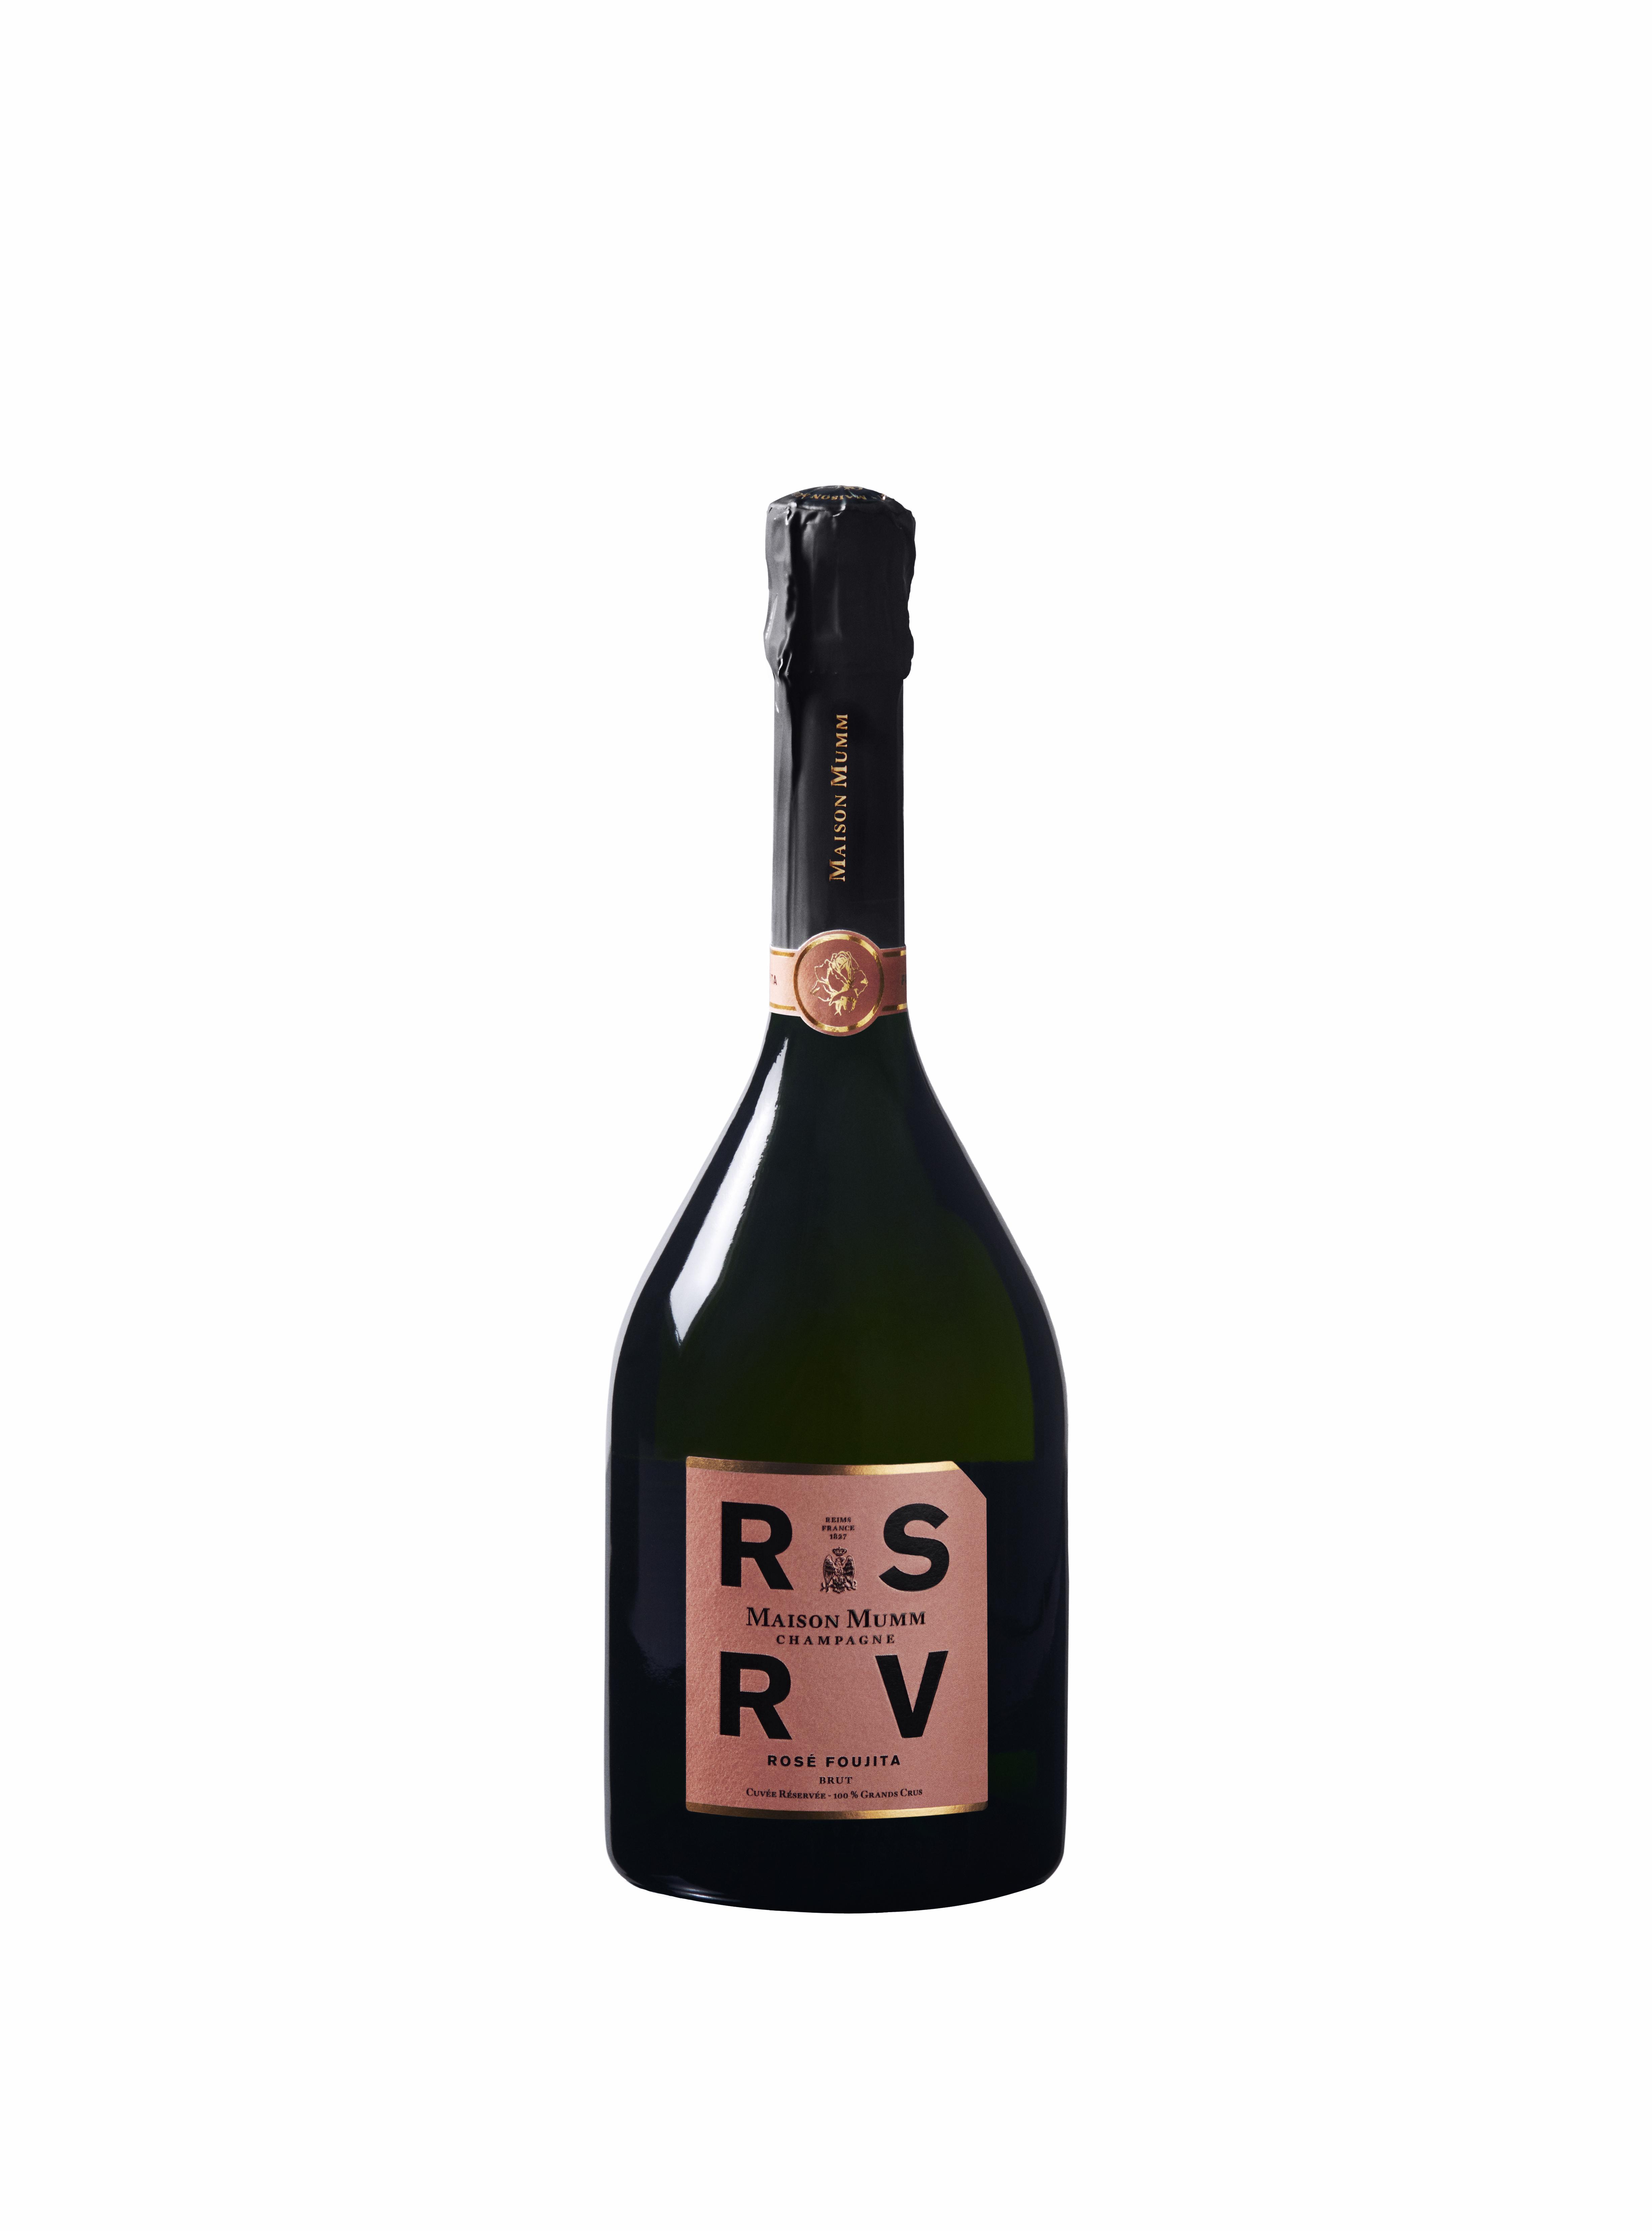 Mumm RSRV Rosé Foujita